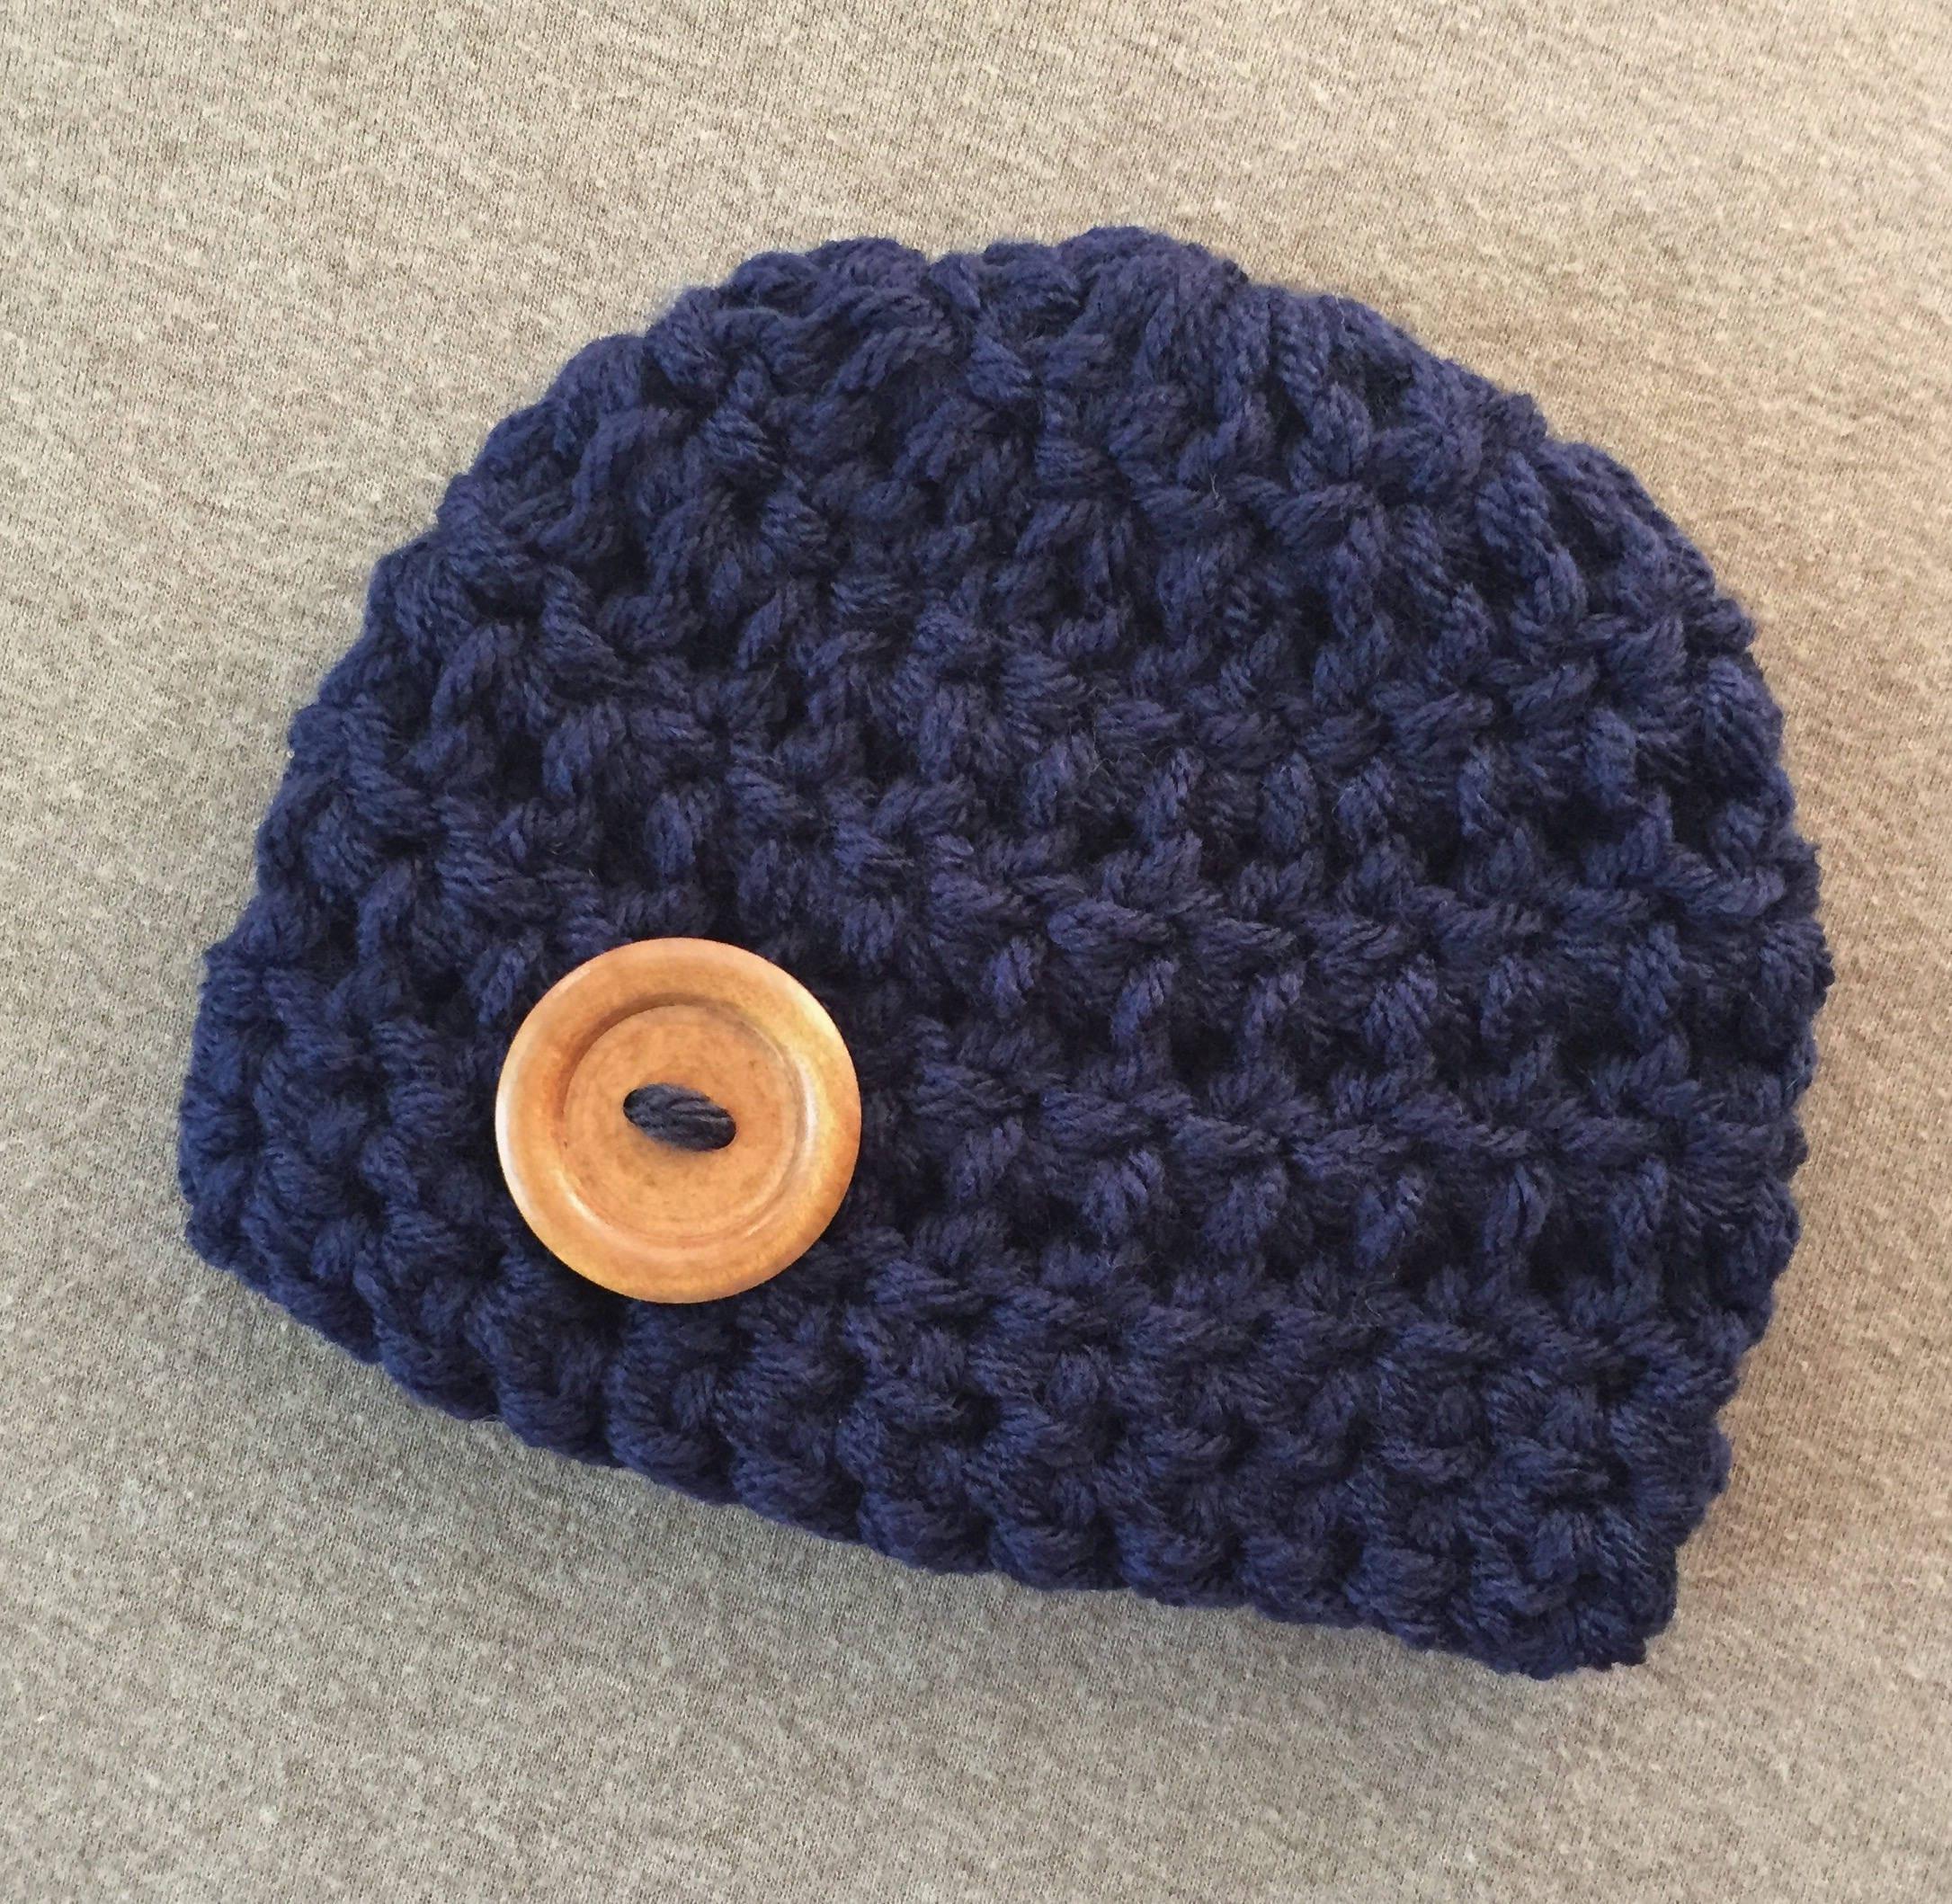 257c29013da Navy blue baby boy hat coming home outfit newborn boy hat knit